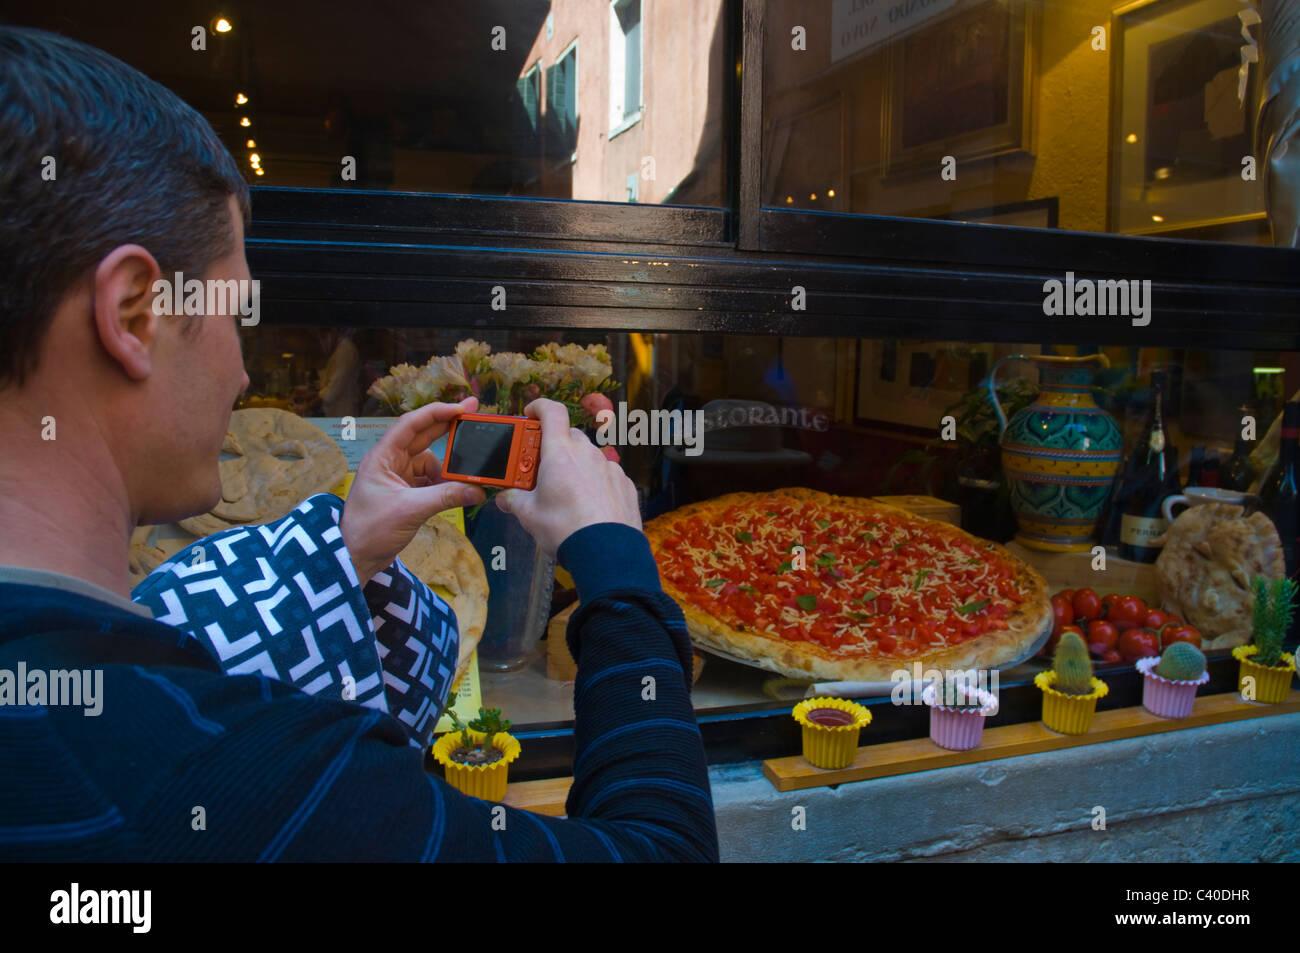 Pizzeria Venice Veneto Stockfotos & Pizzeria Venice Veneto Bilder ...